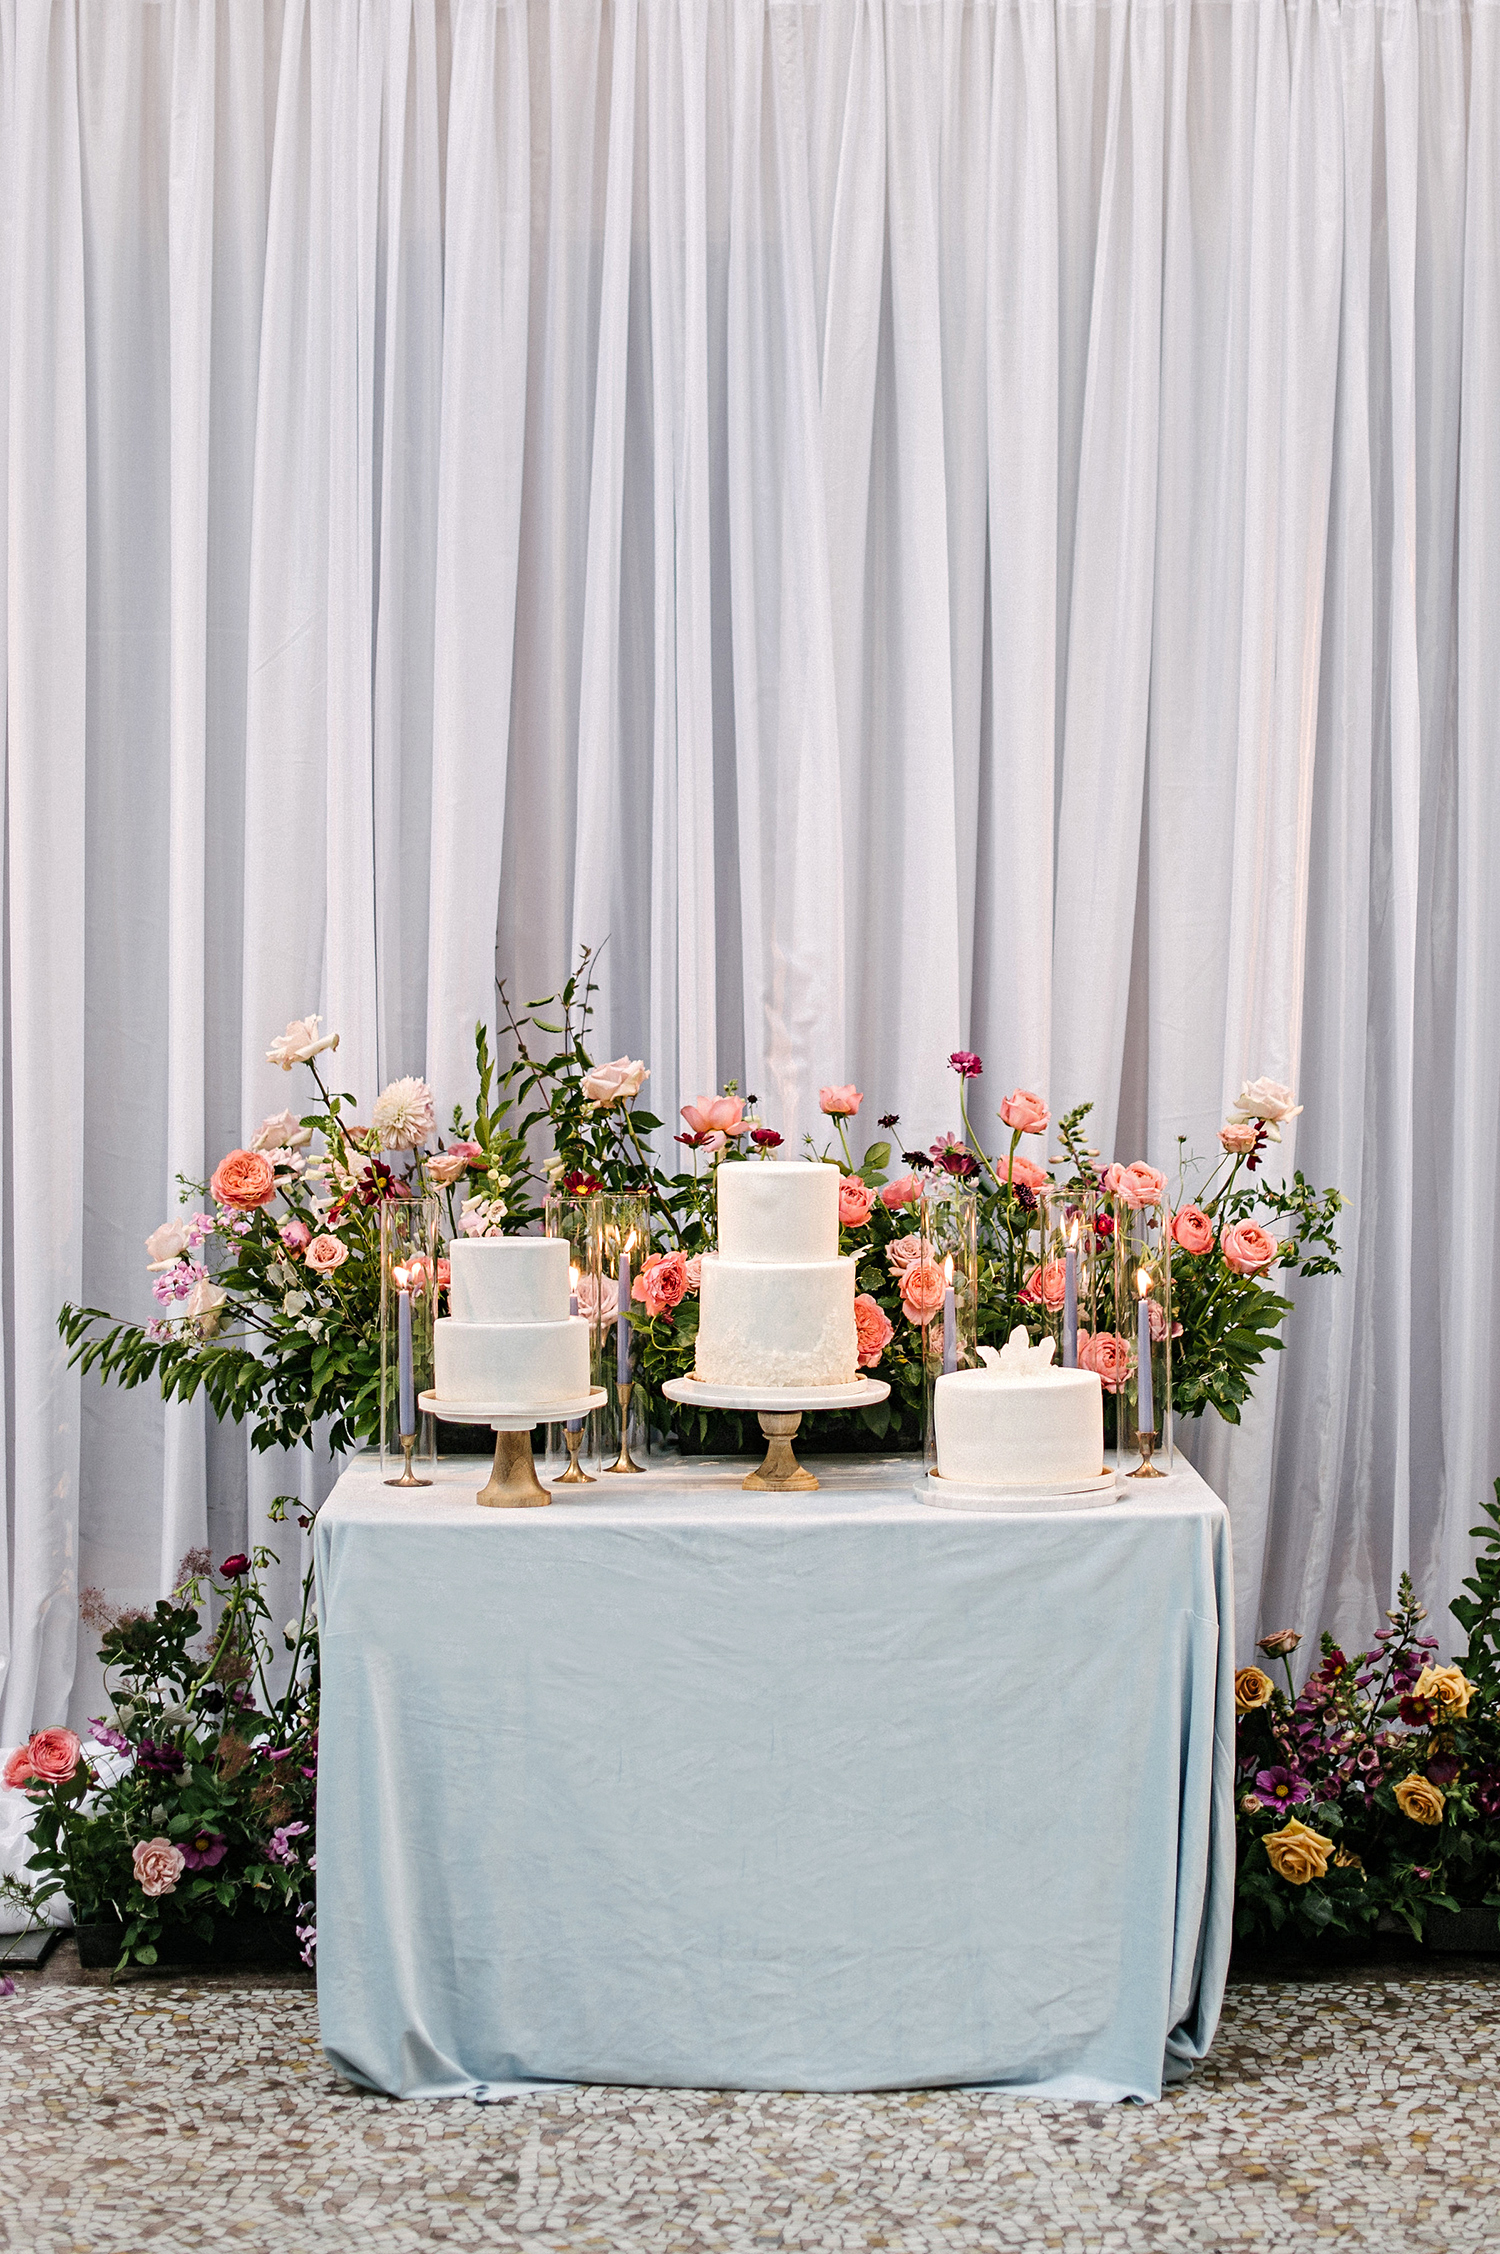 stephanie tim wedding cakes on table